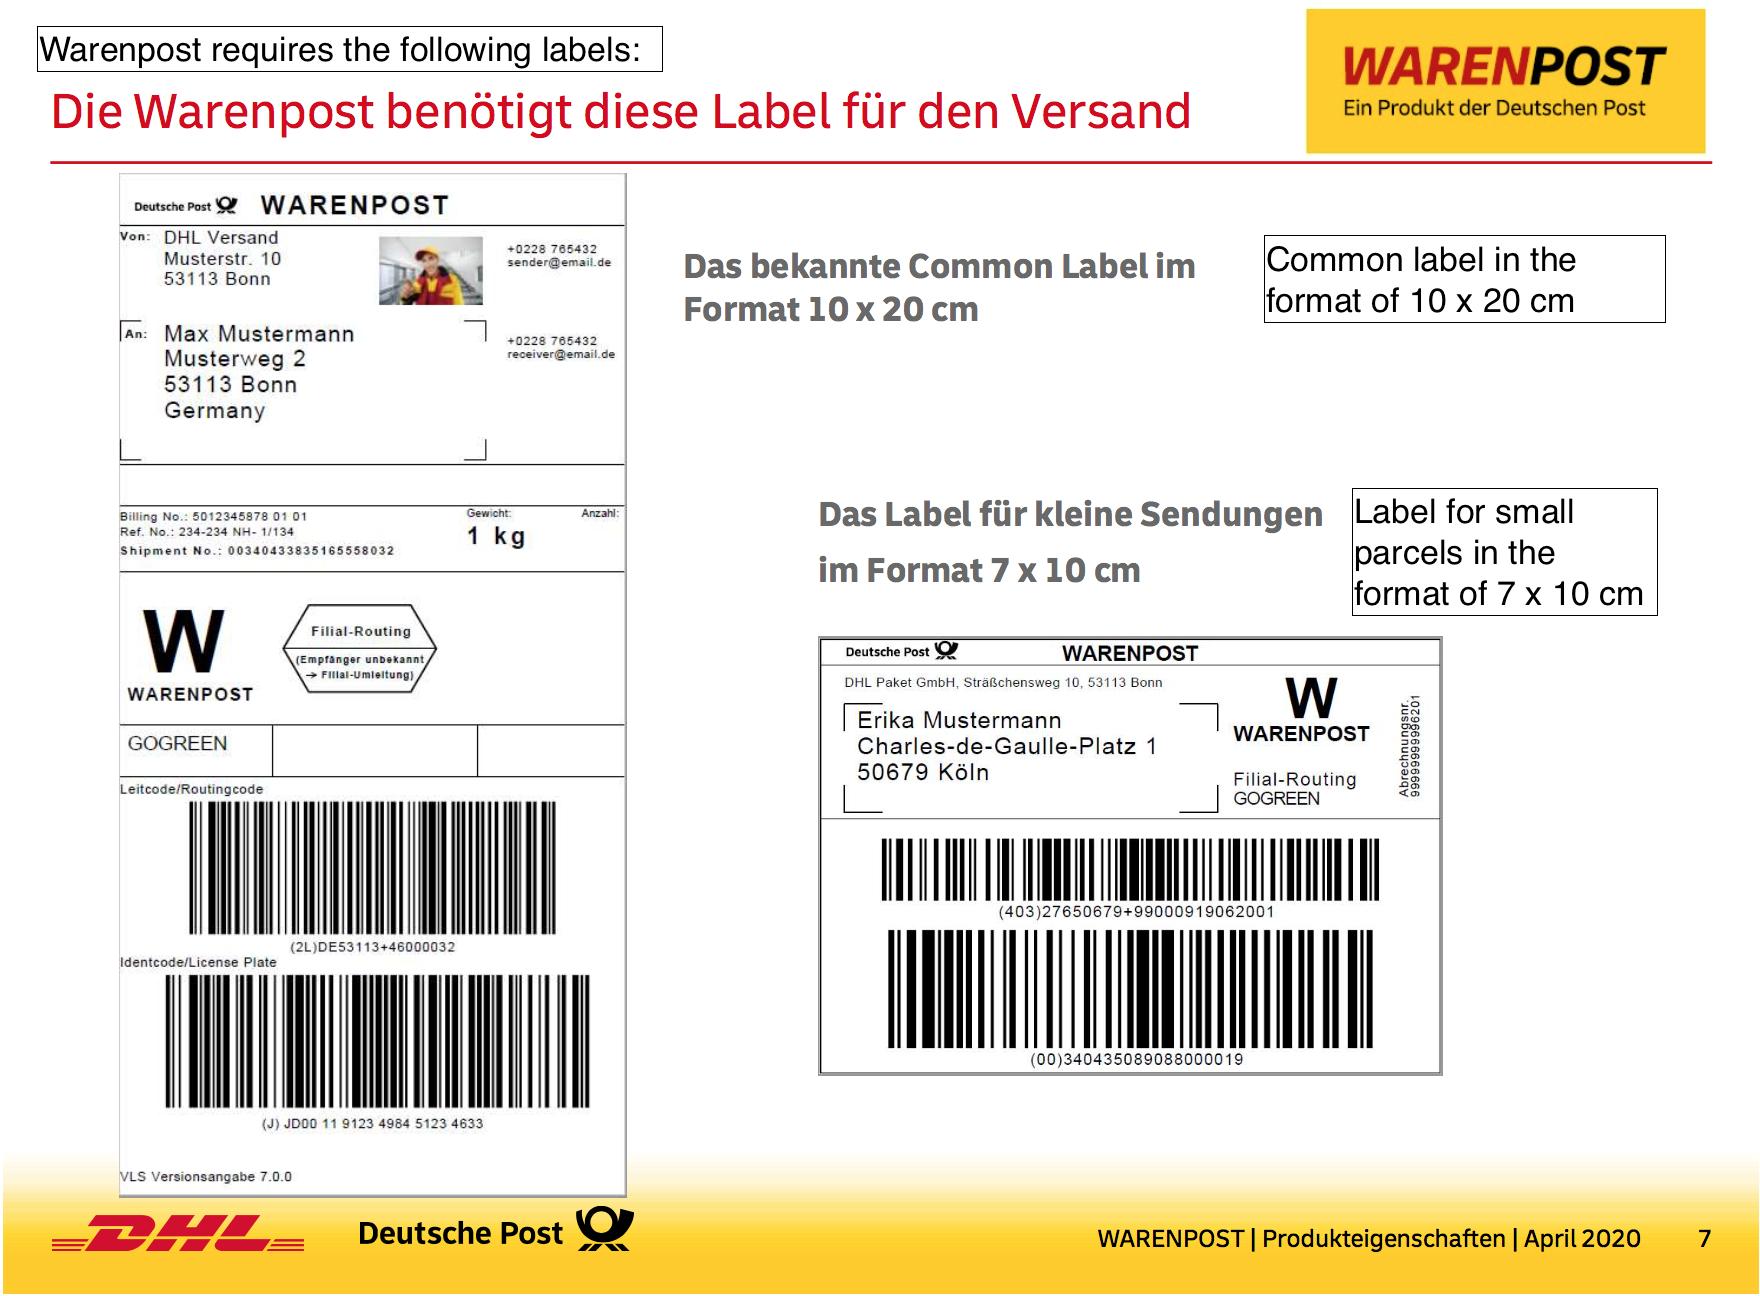 dhl warenpost label size german